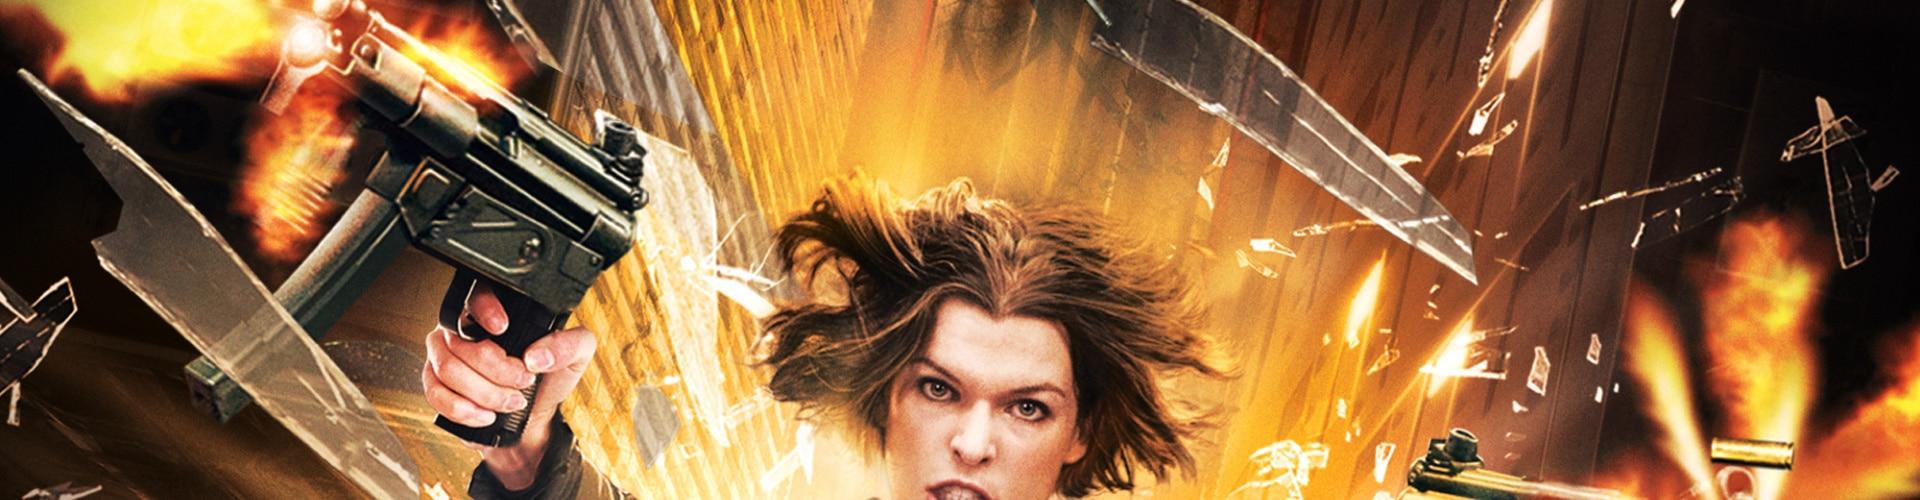 Watch Resident Evil: Afterlife Online